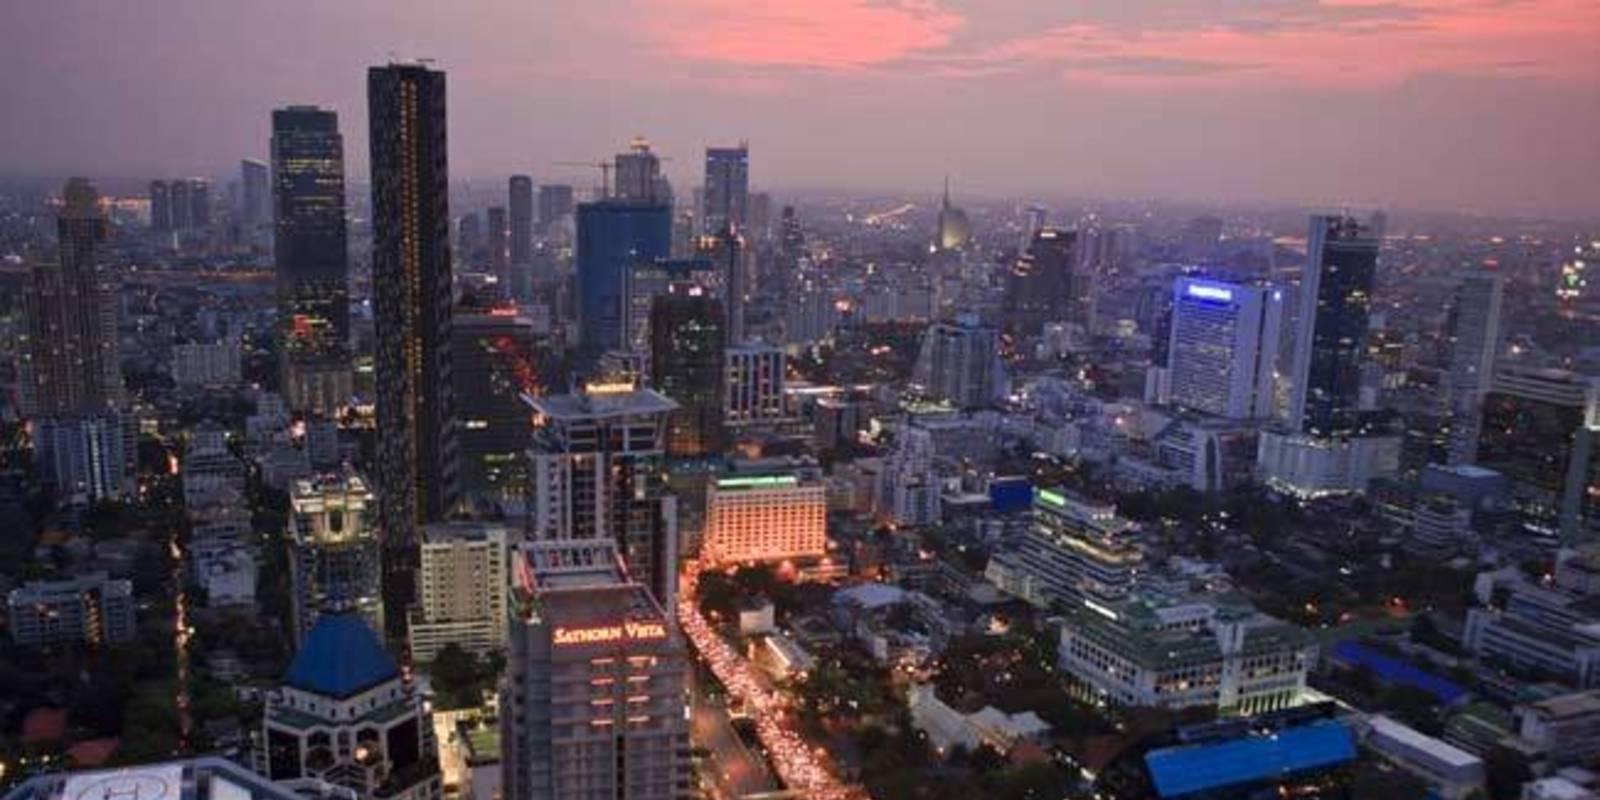 Suvarnabhumi Airport | New Bangkok Airport Guide